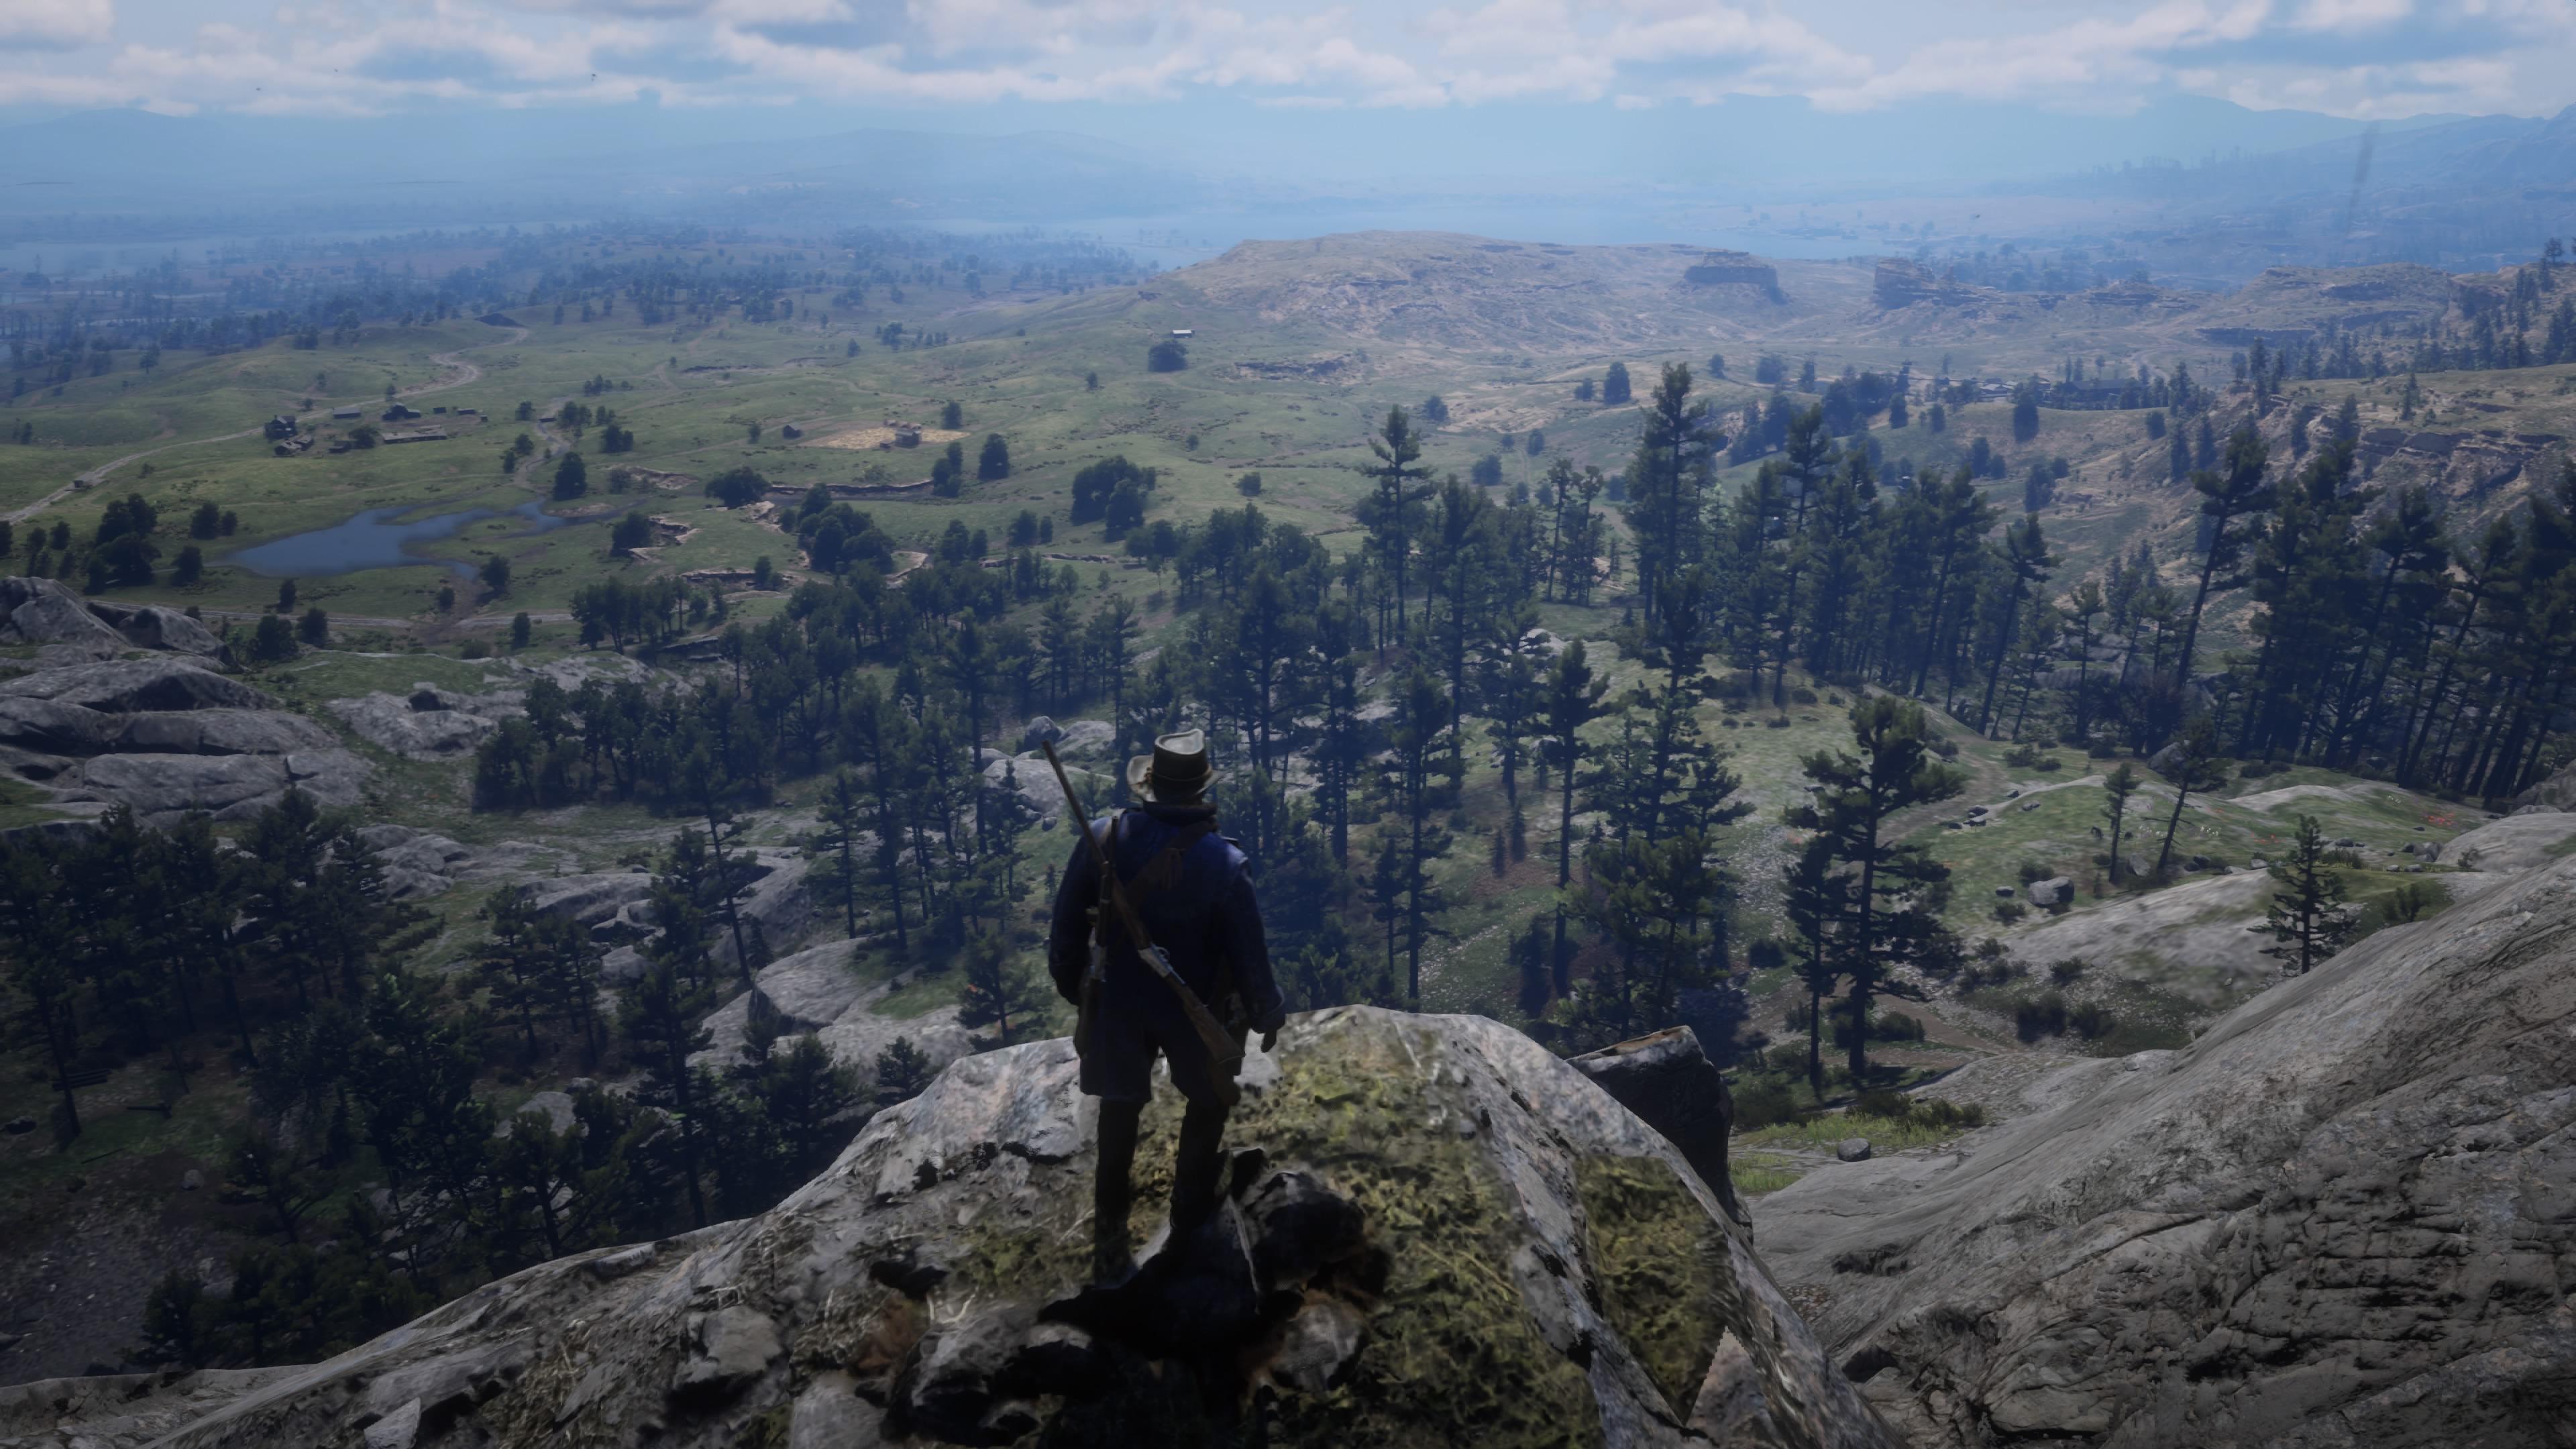 Red Dead Redemption 2 maisemaa kerrakseen